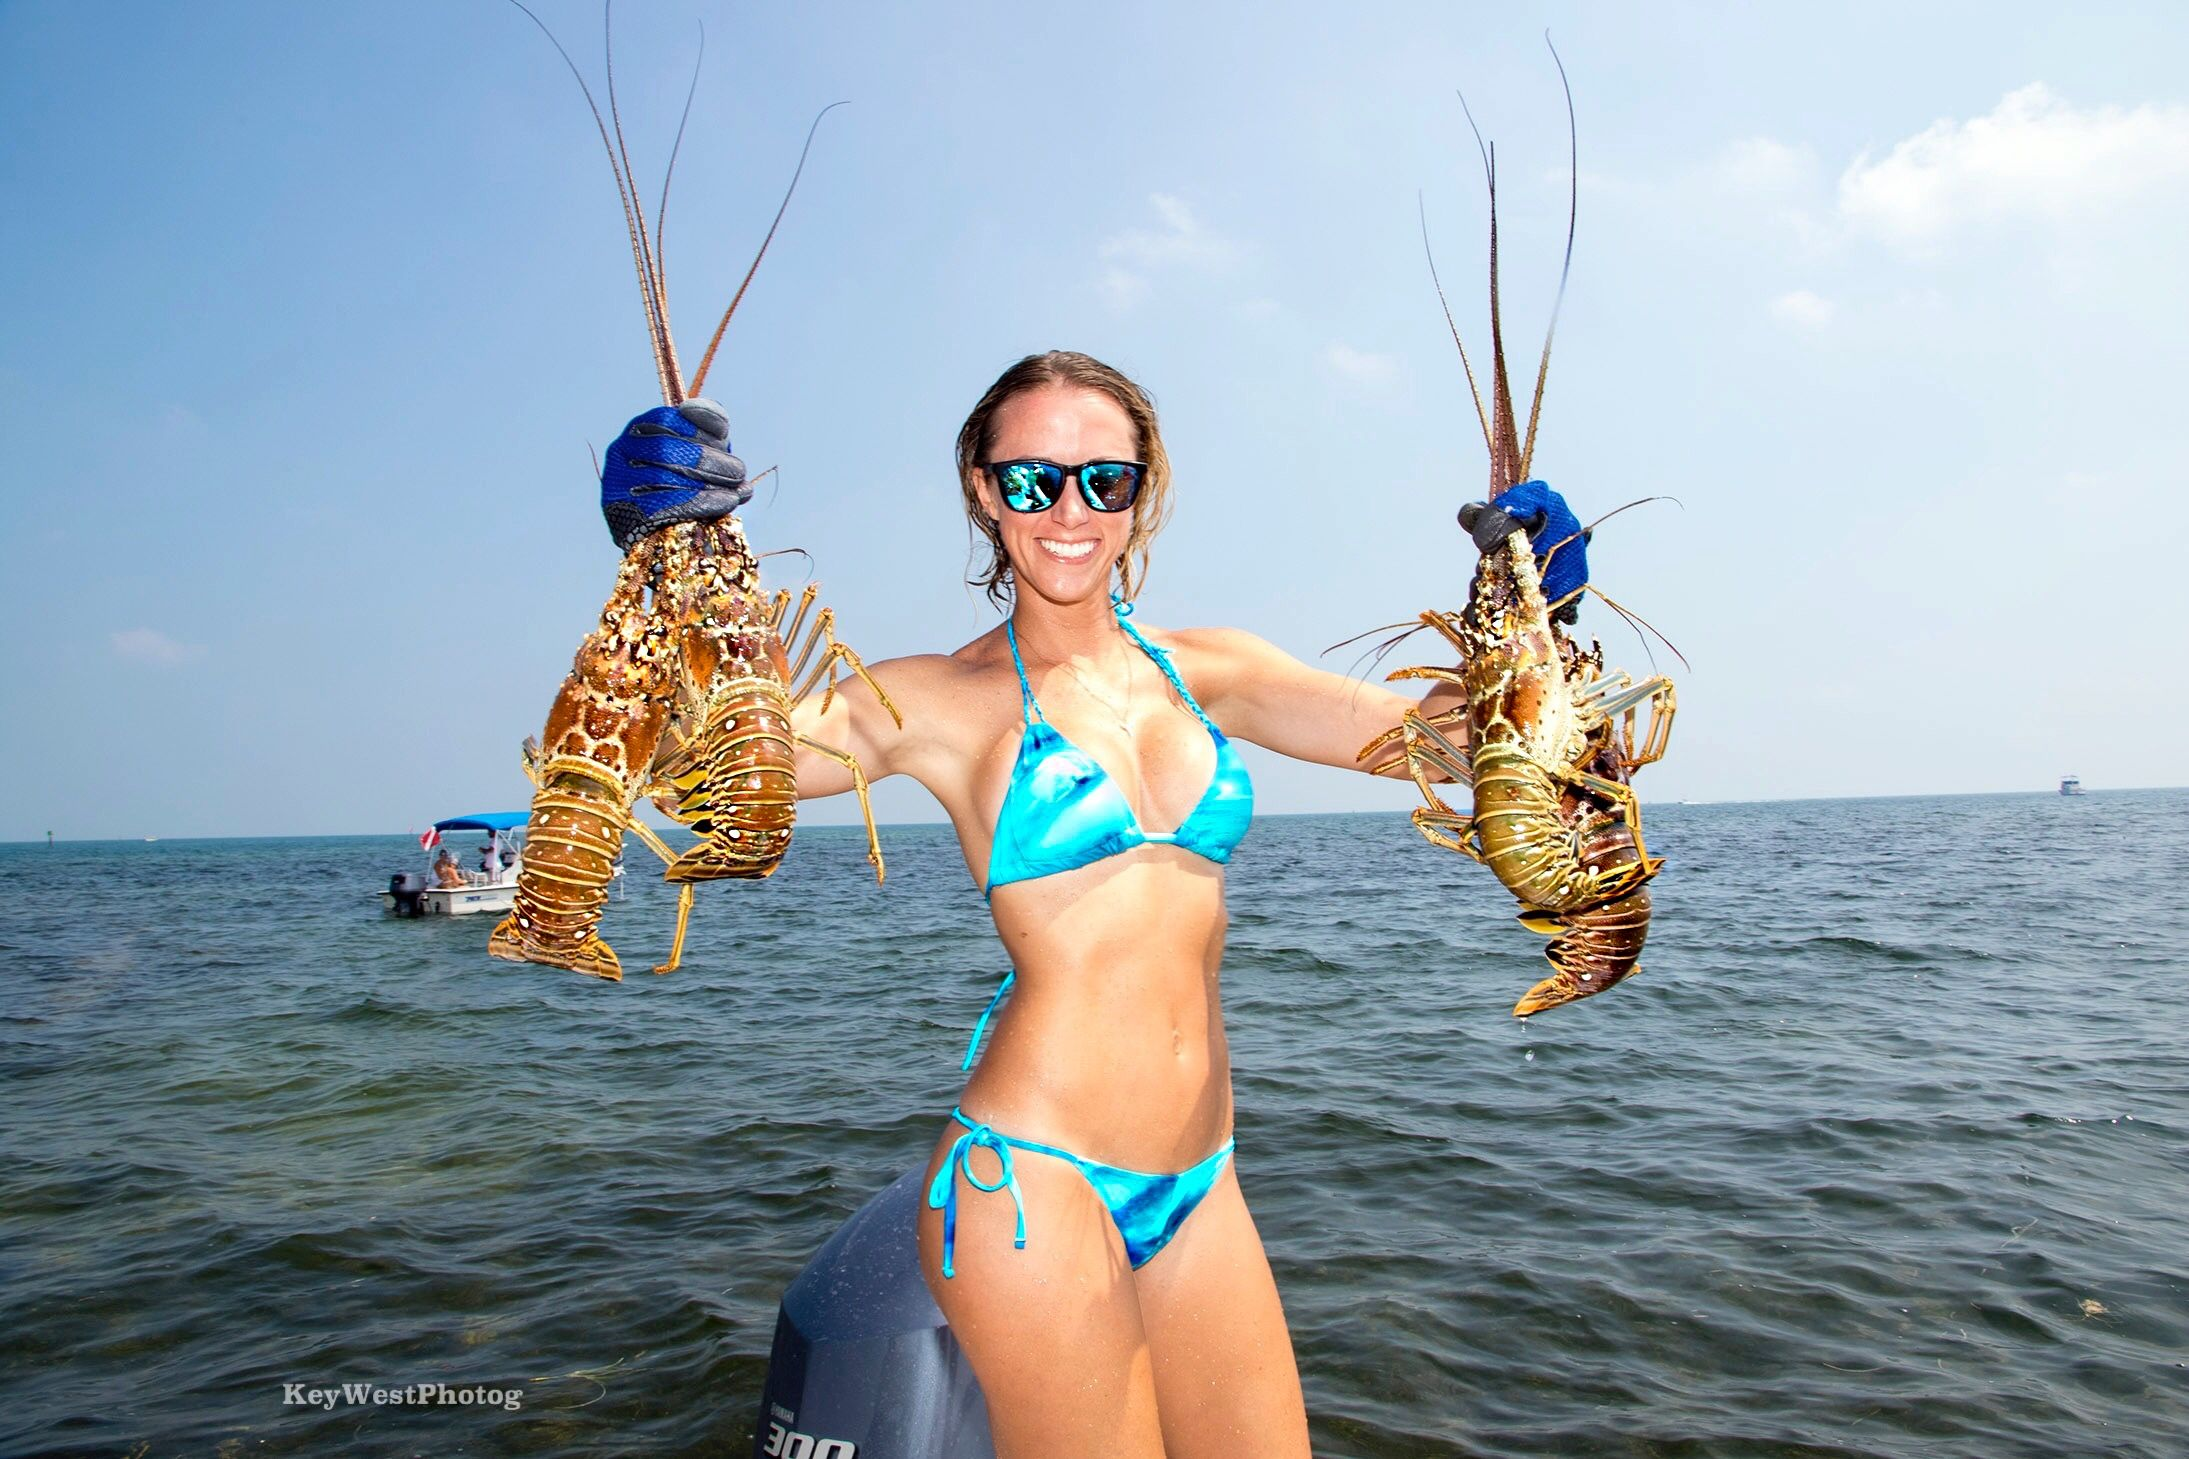 Bikini Fishing Videos photo 5